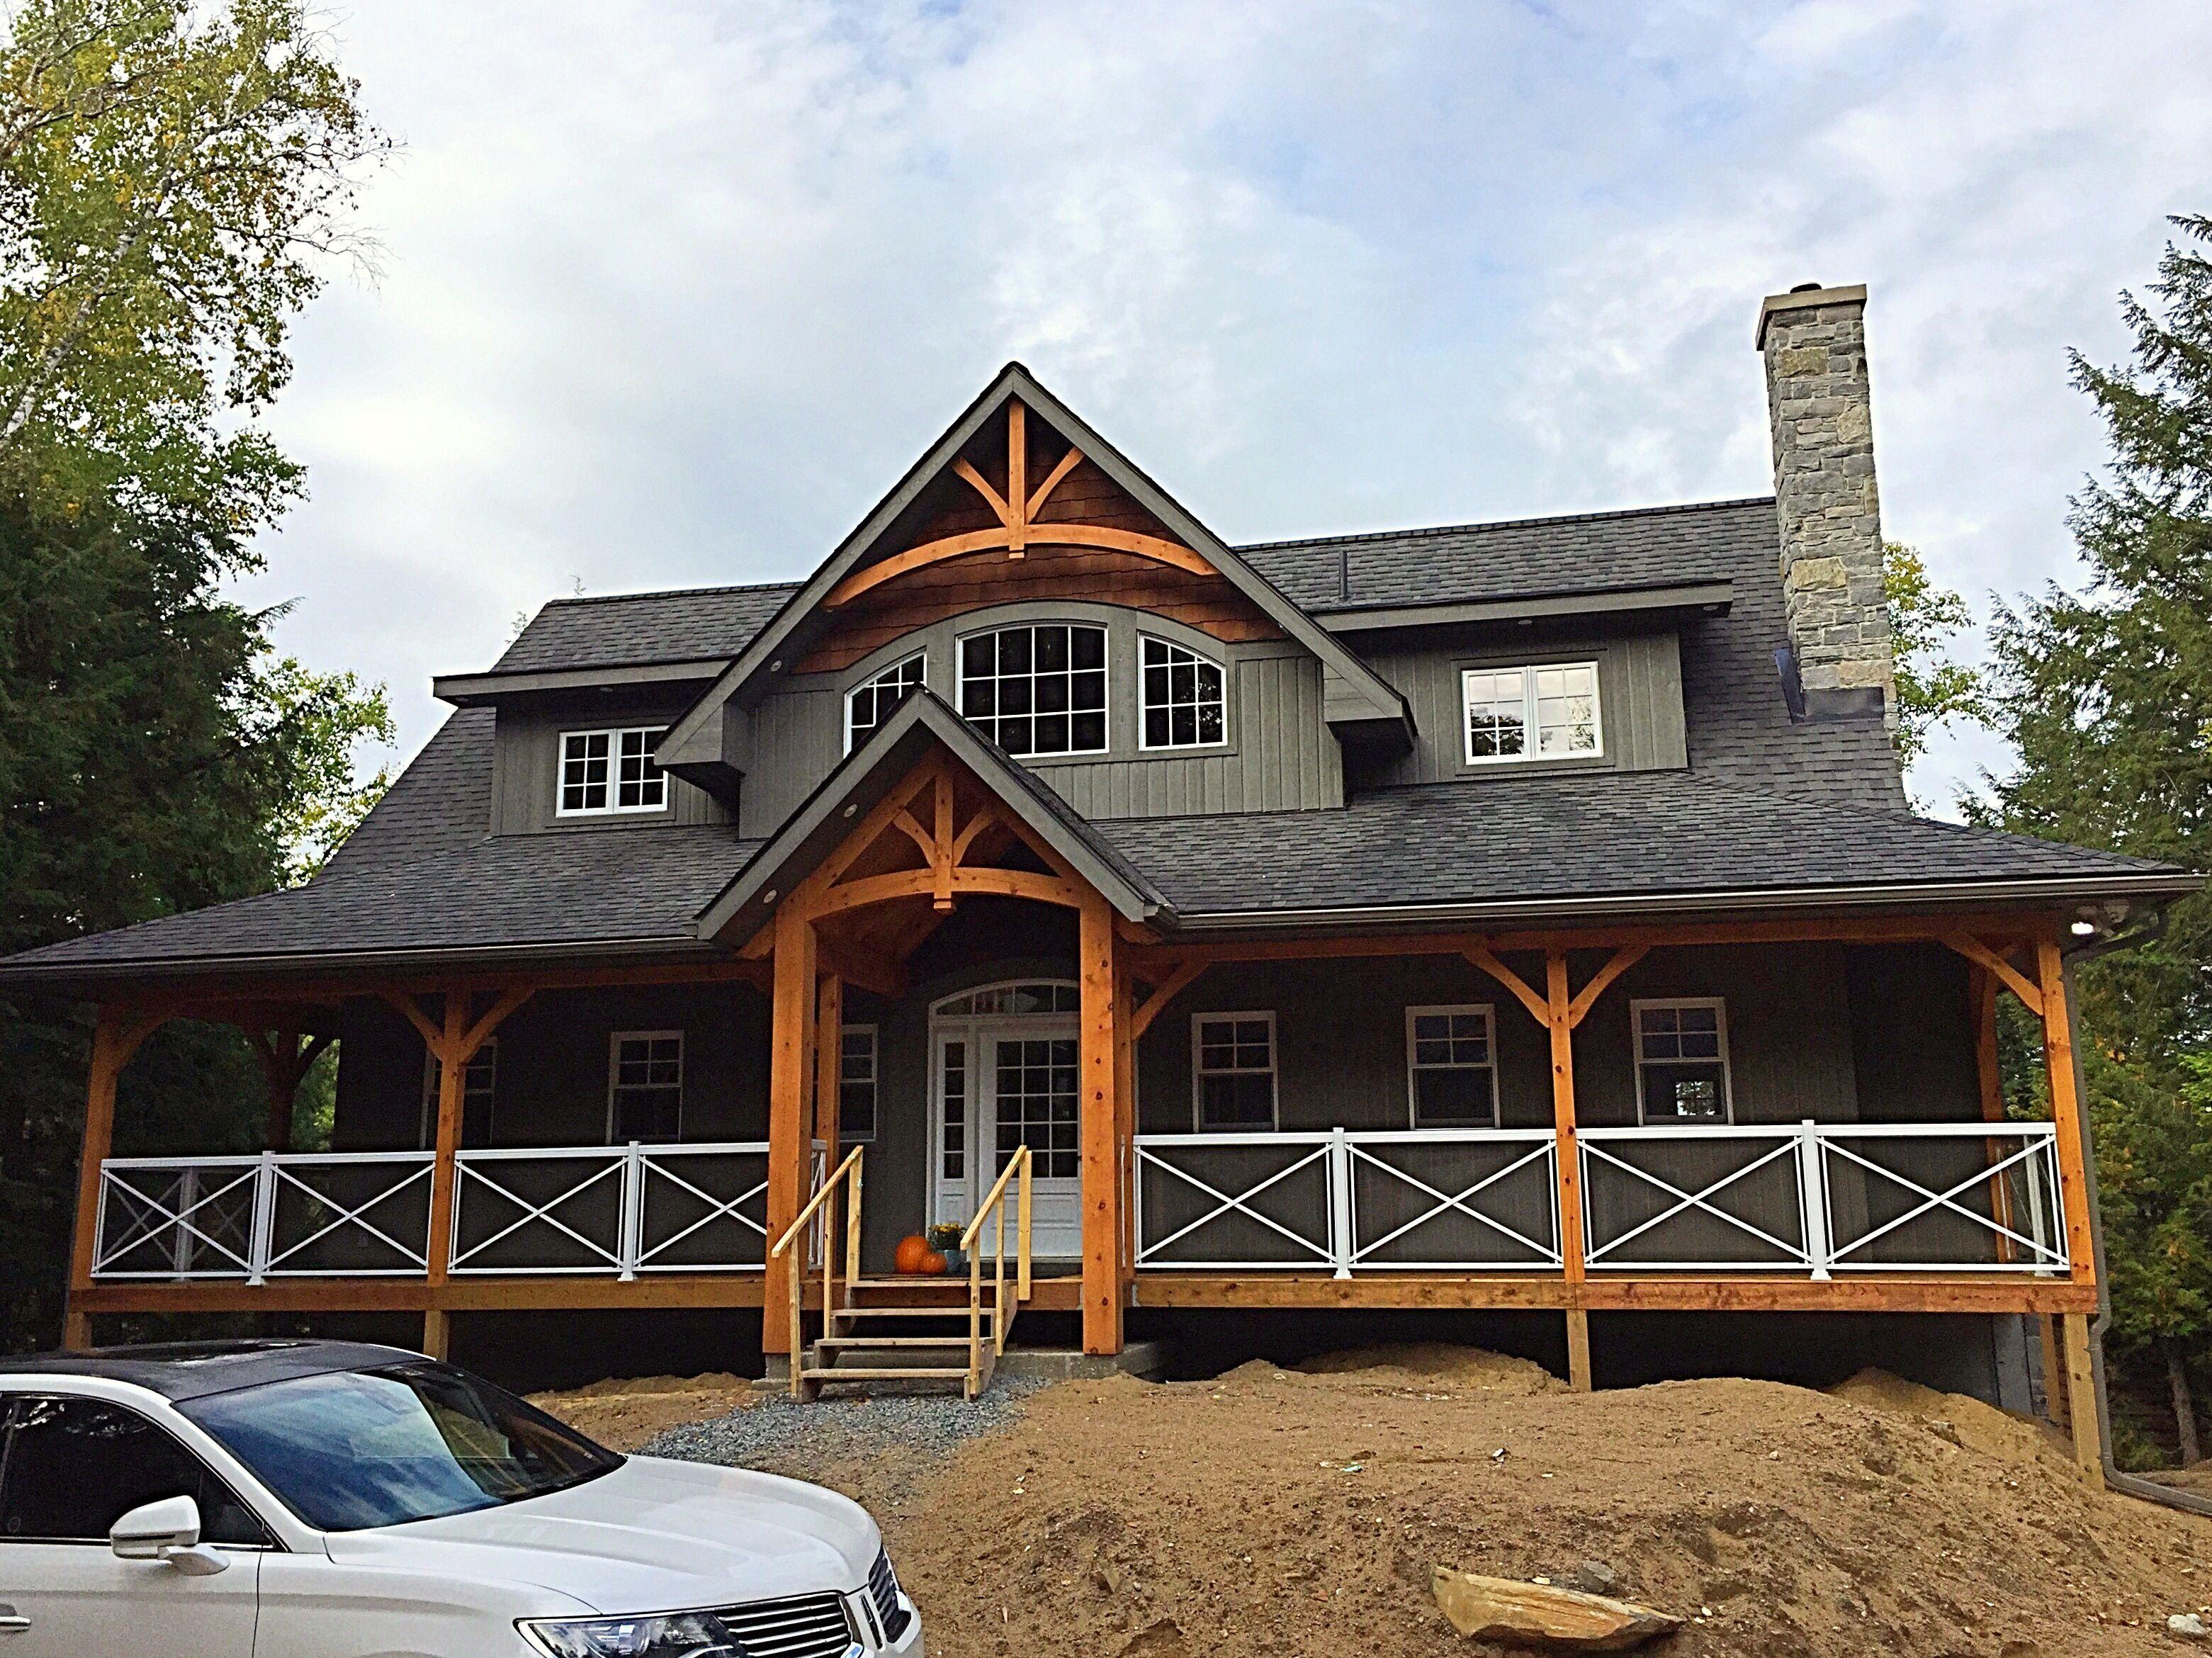 957ee1396a169fae30d813f8feb91f14 Grey Cedar Shake House Plans on one story, for siding,